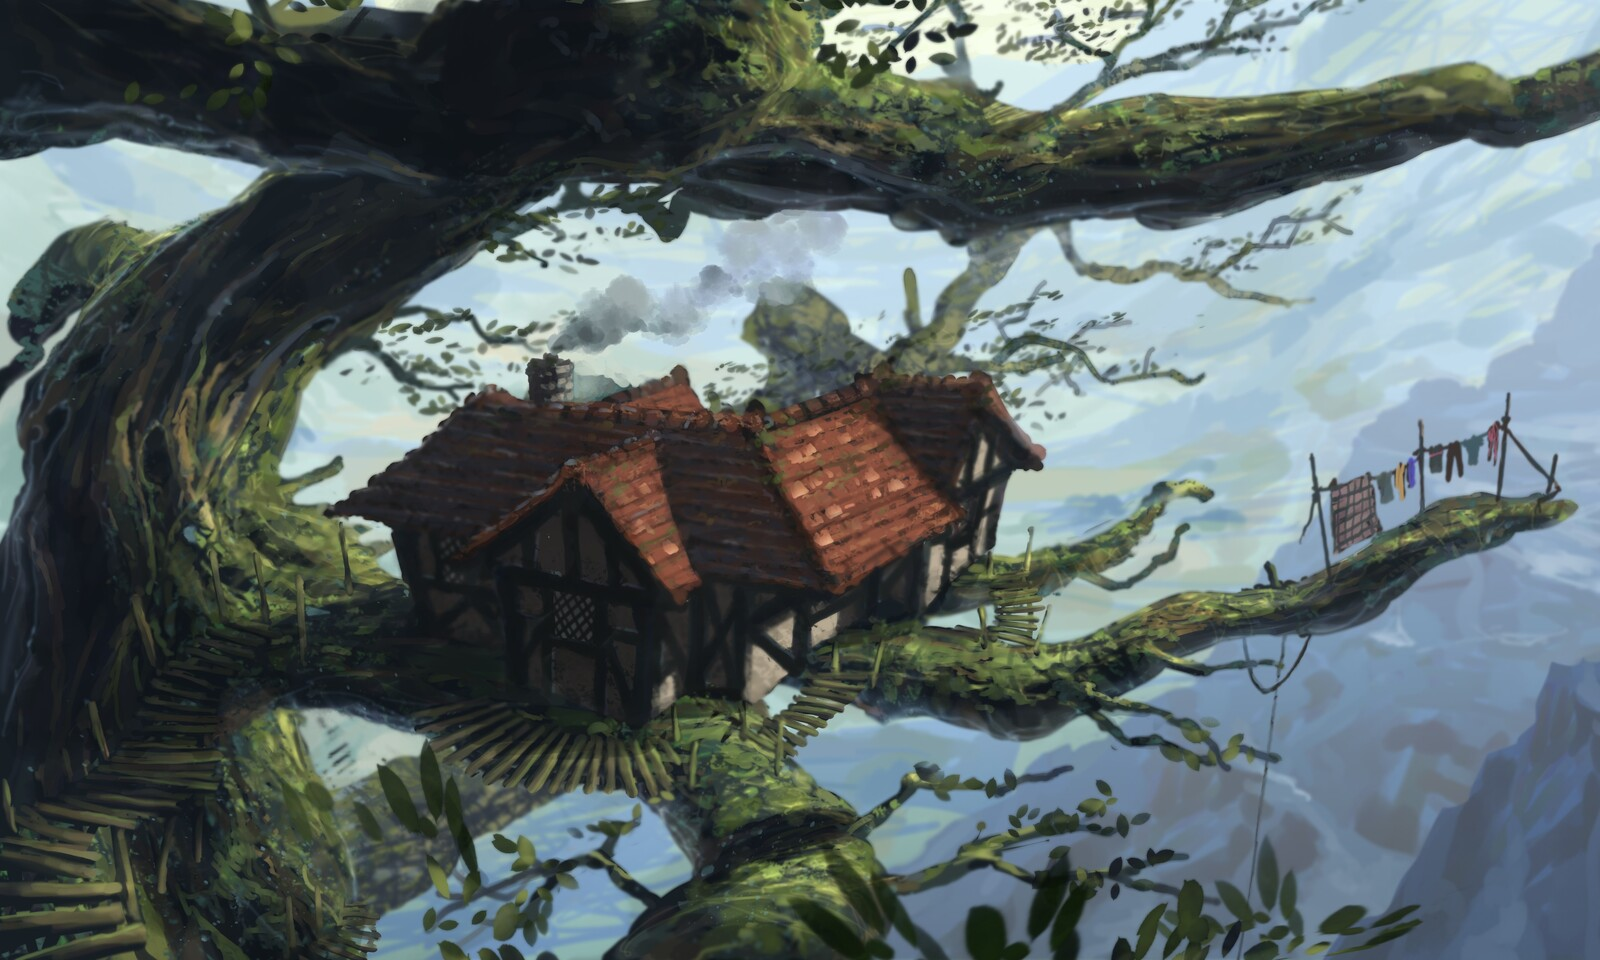 Treehouse - Concept design